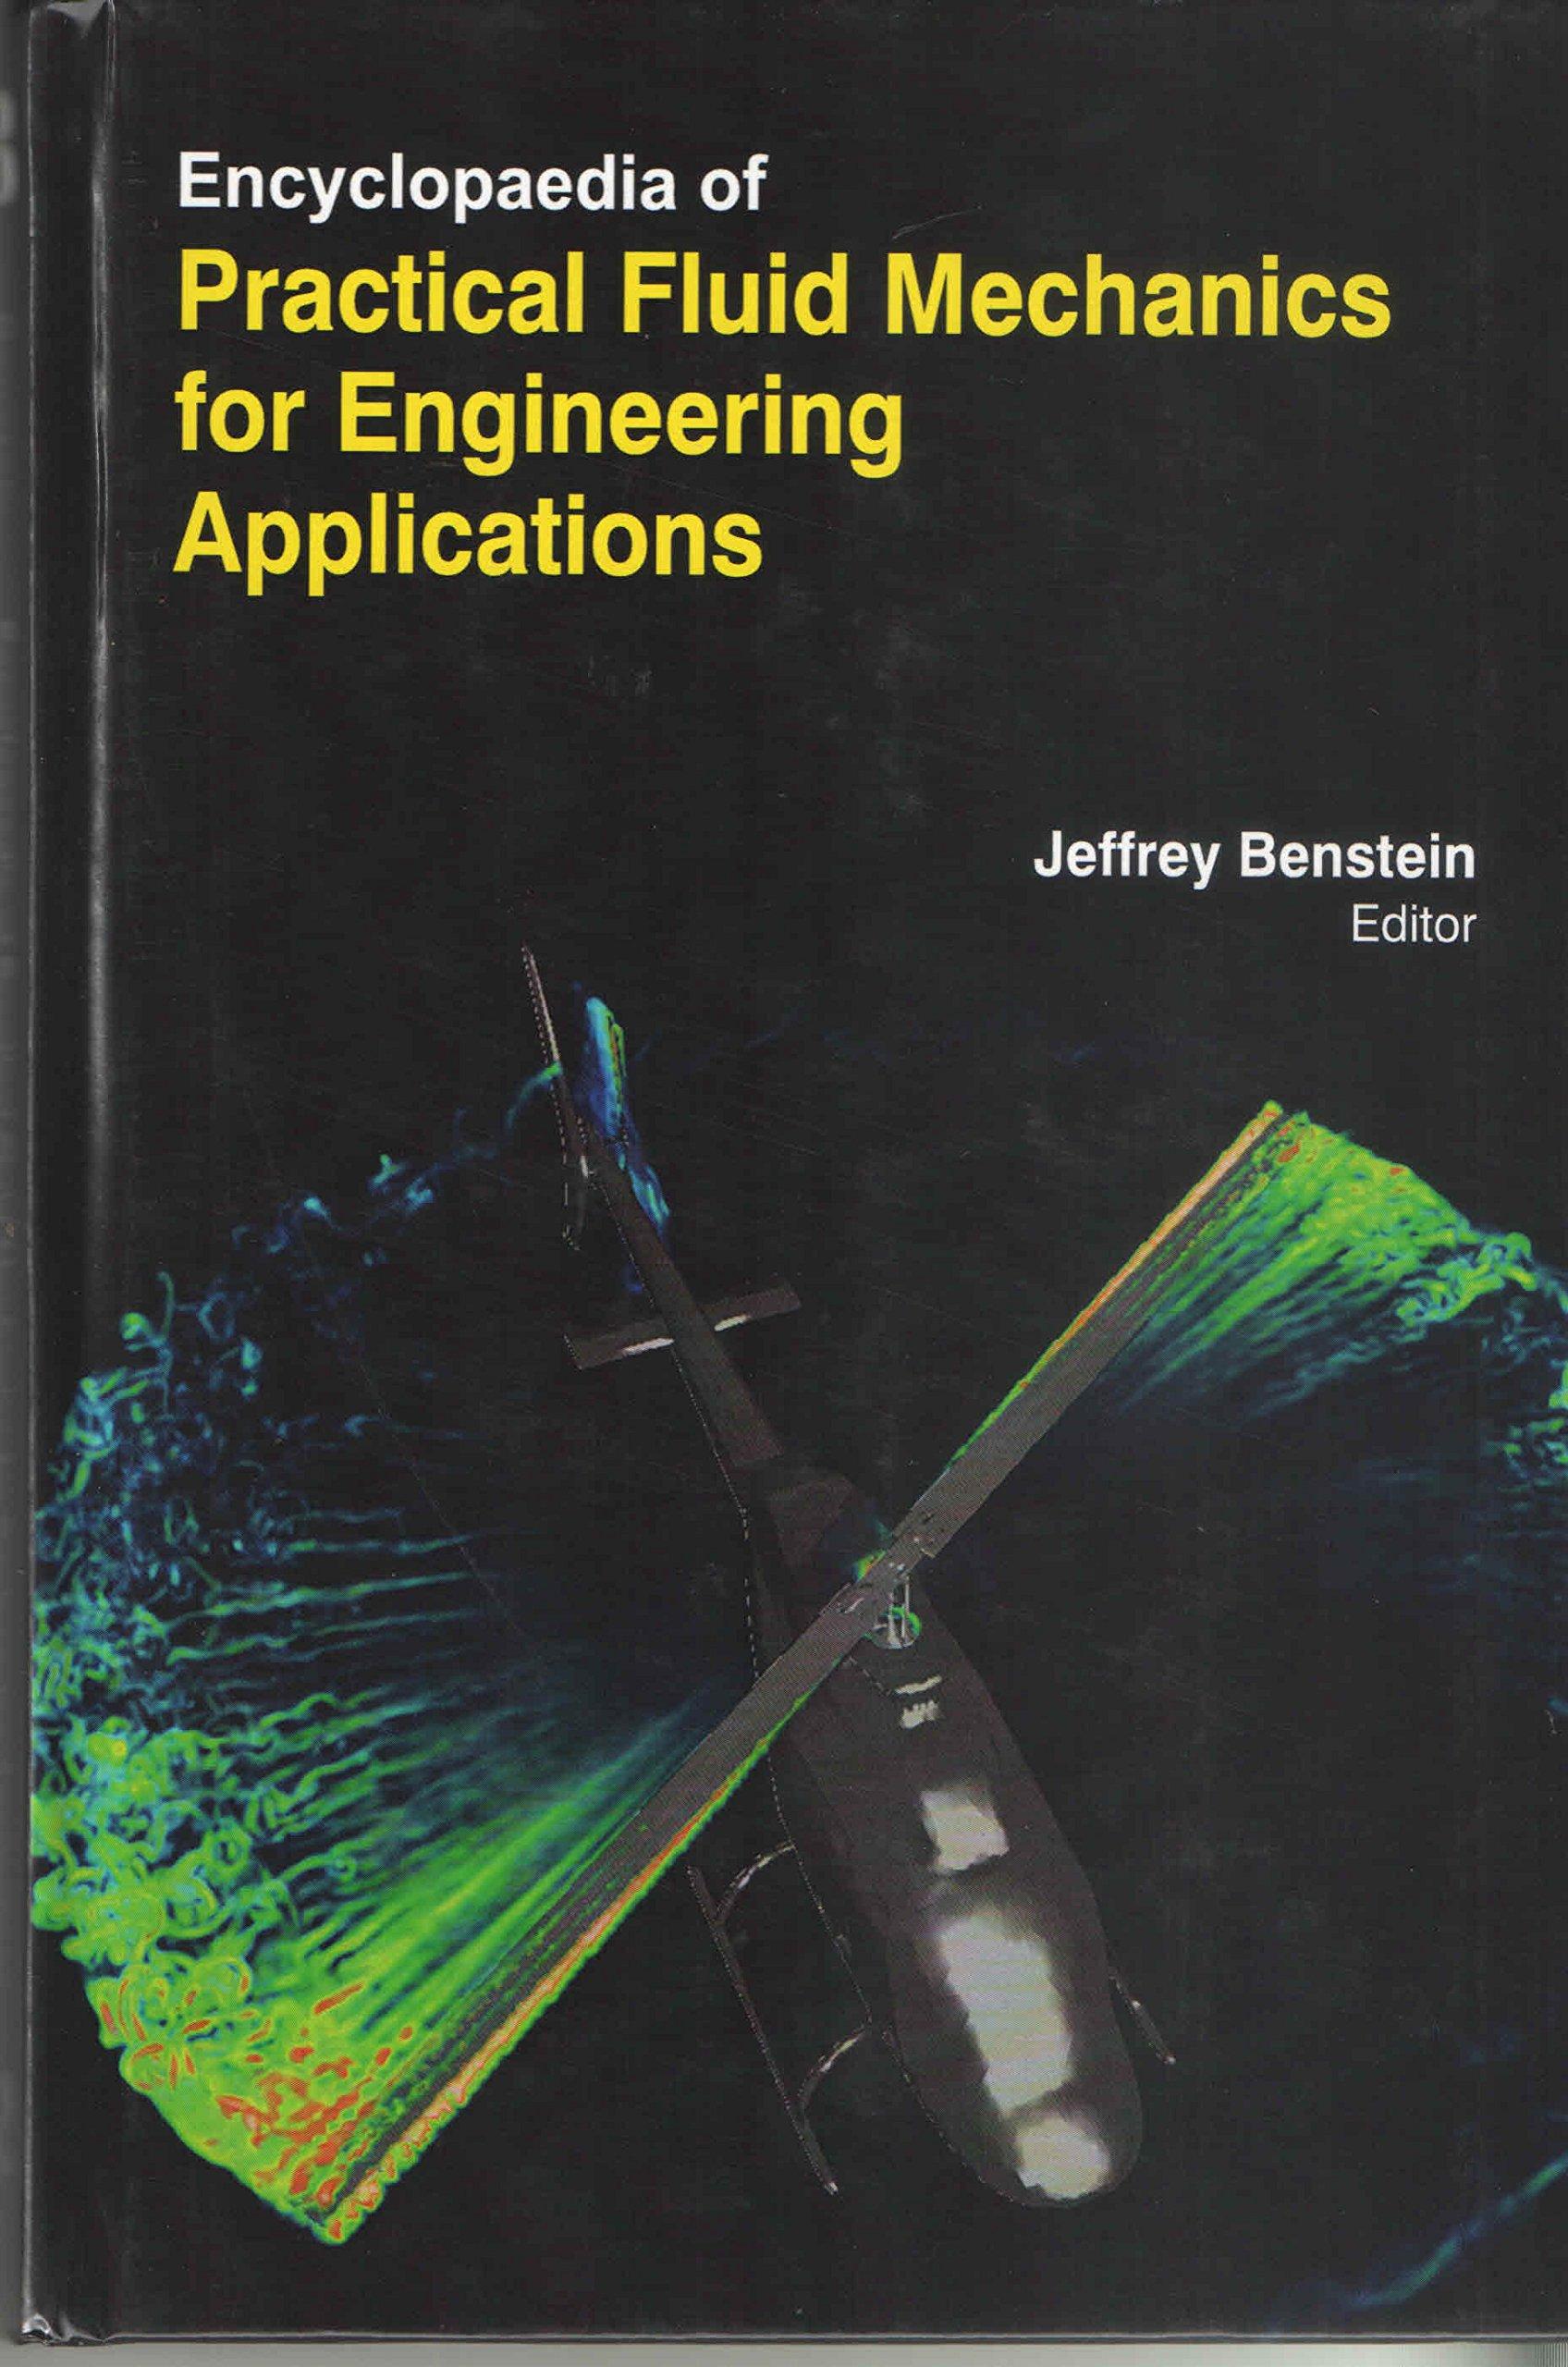 Encyclopaedia Of Practical Fluid Mechanics For Engineering Applications (3 Volumes) ebook